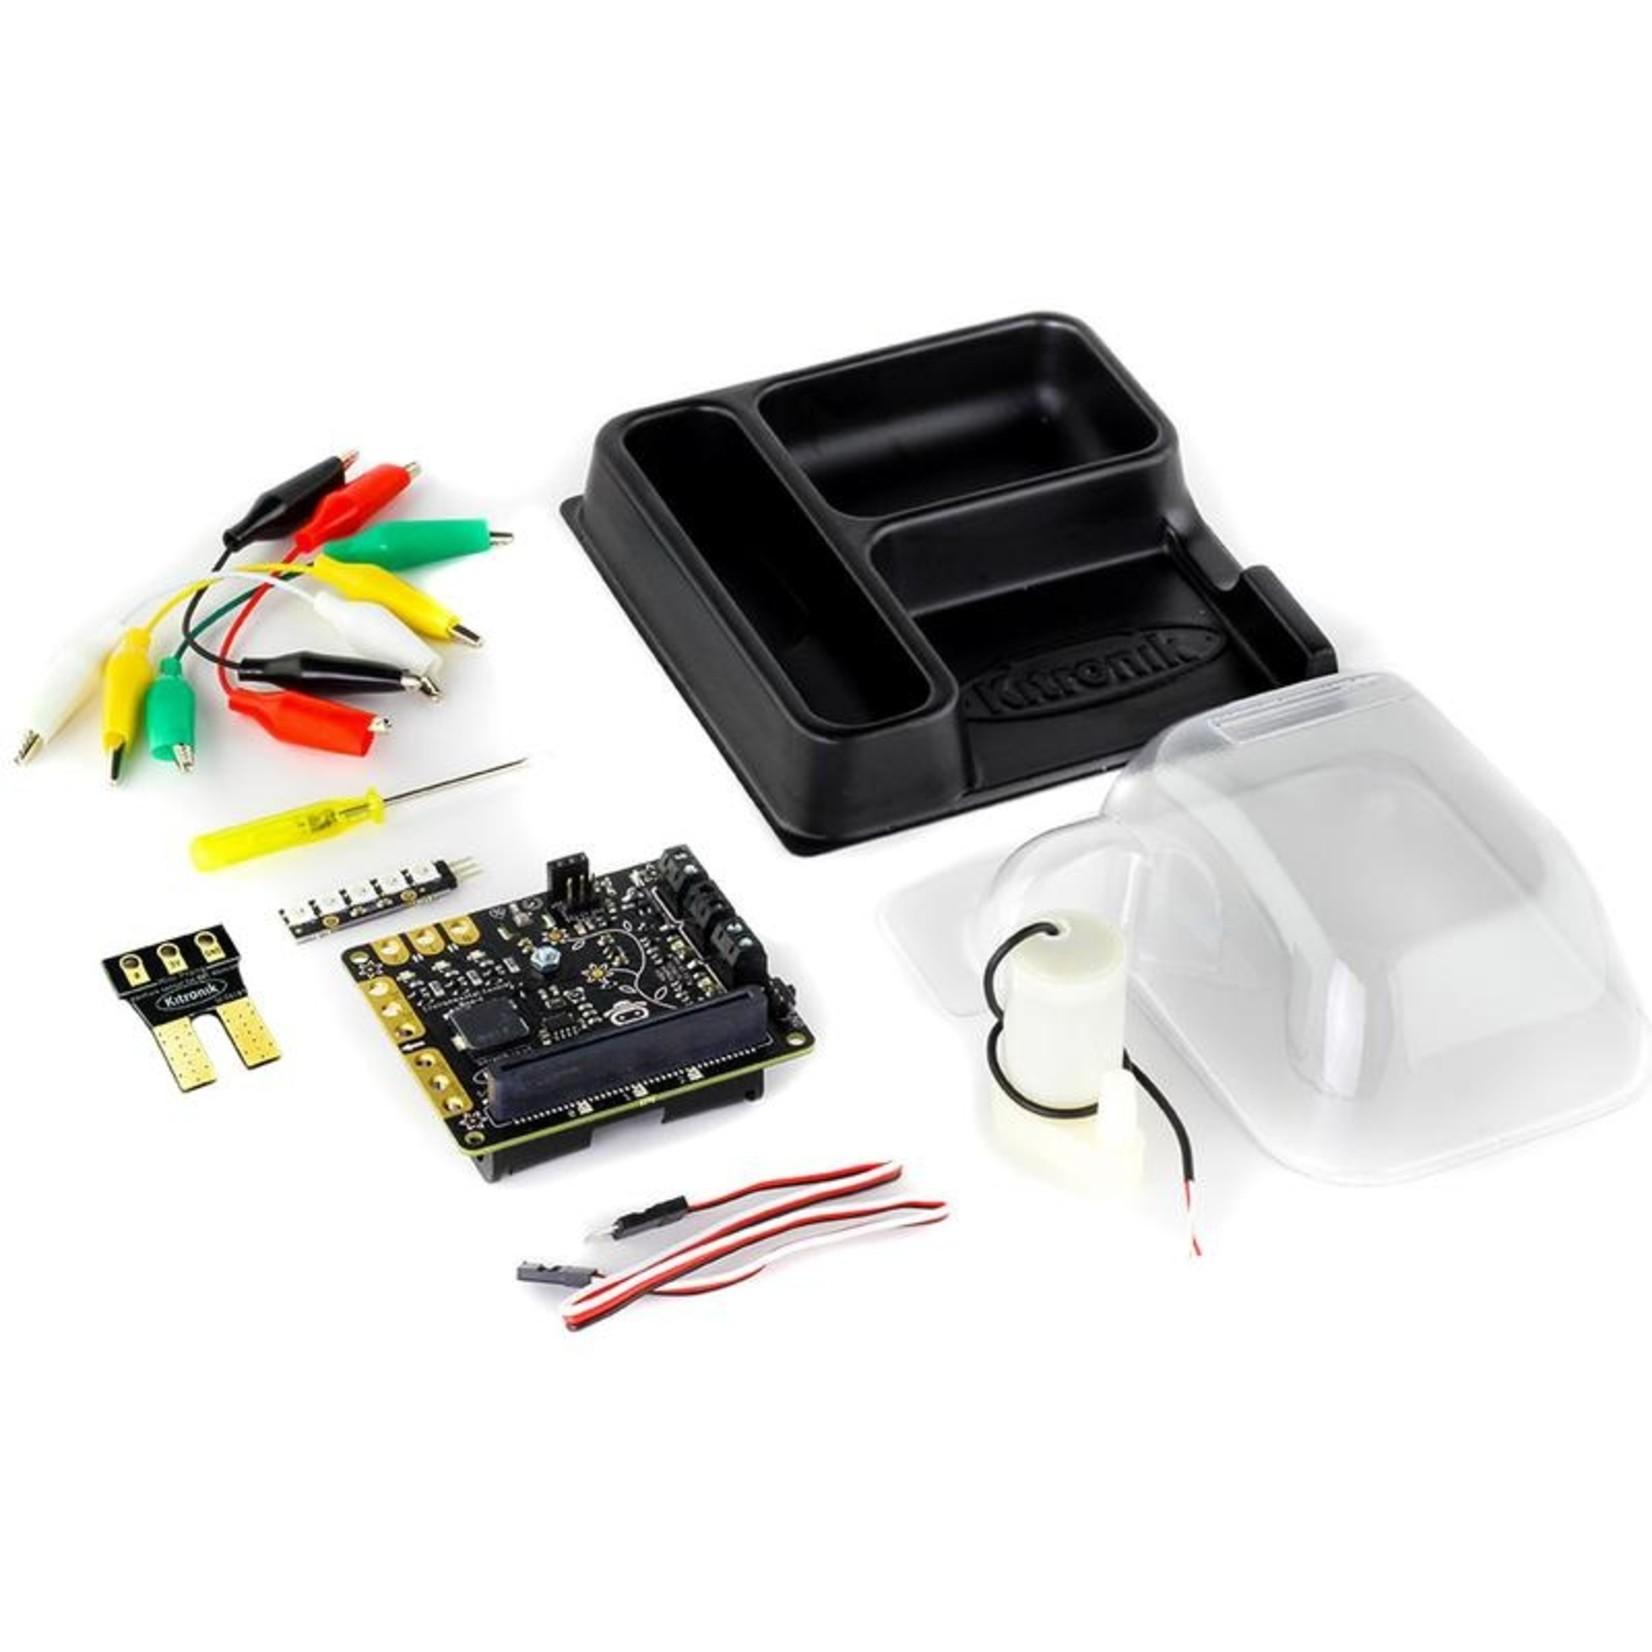 Kitronik Slimme serre kit voor micro:bit